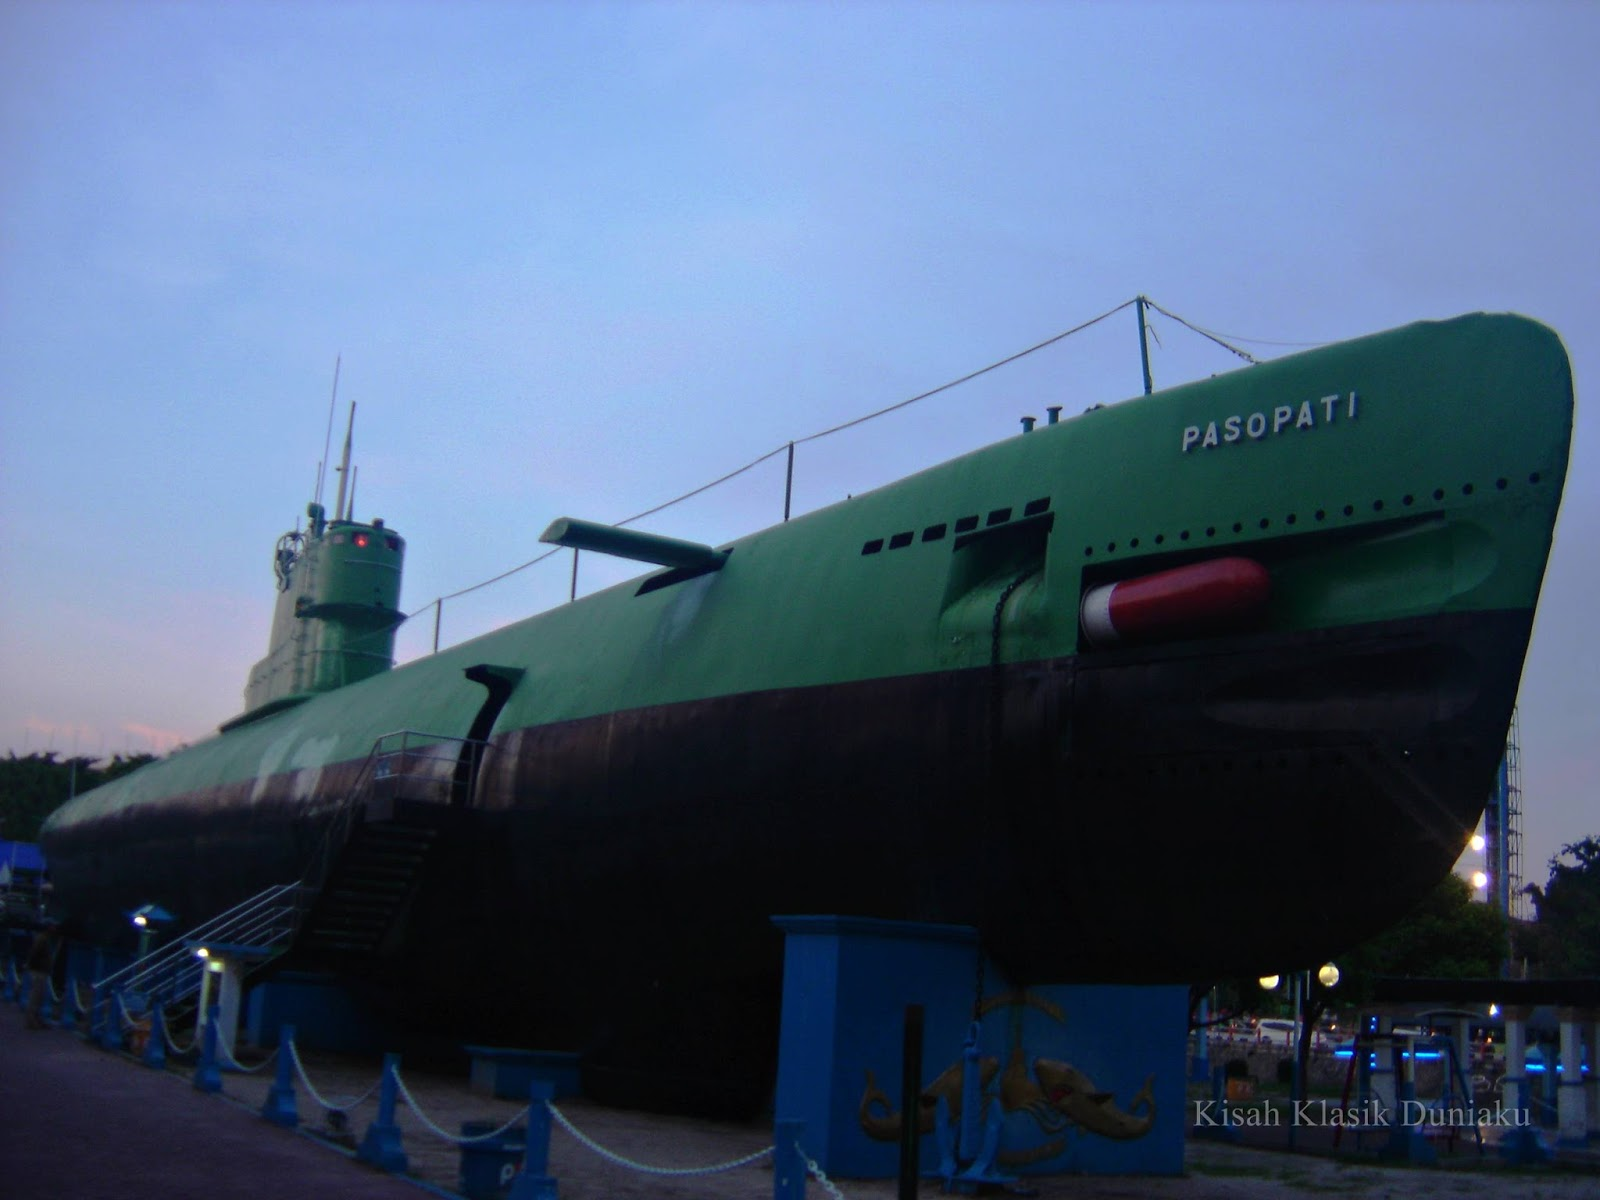 Kisah Klasik Duniaku Wisata Unik Surabaya Monkasel Aja Submarine Monument